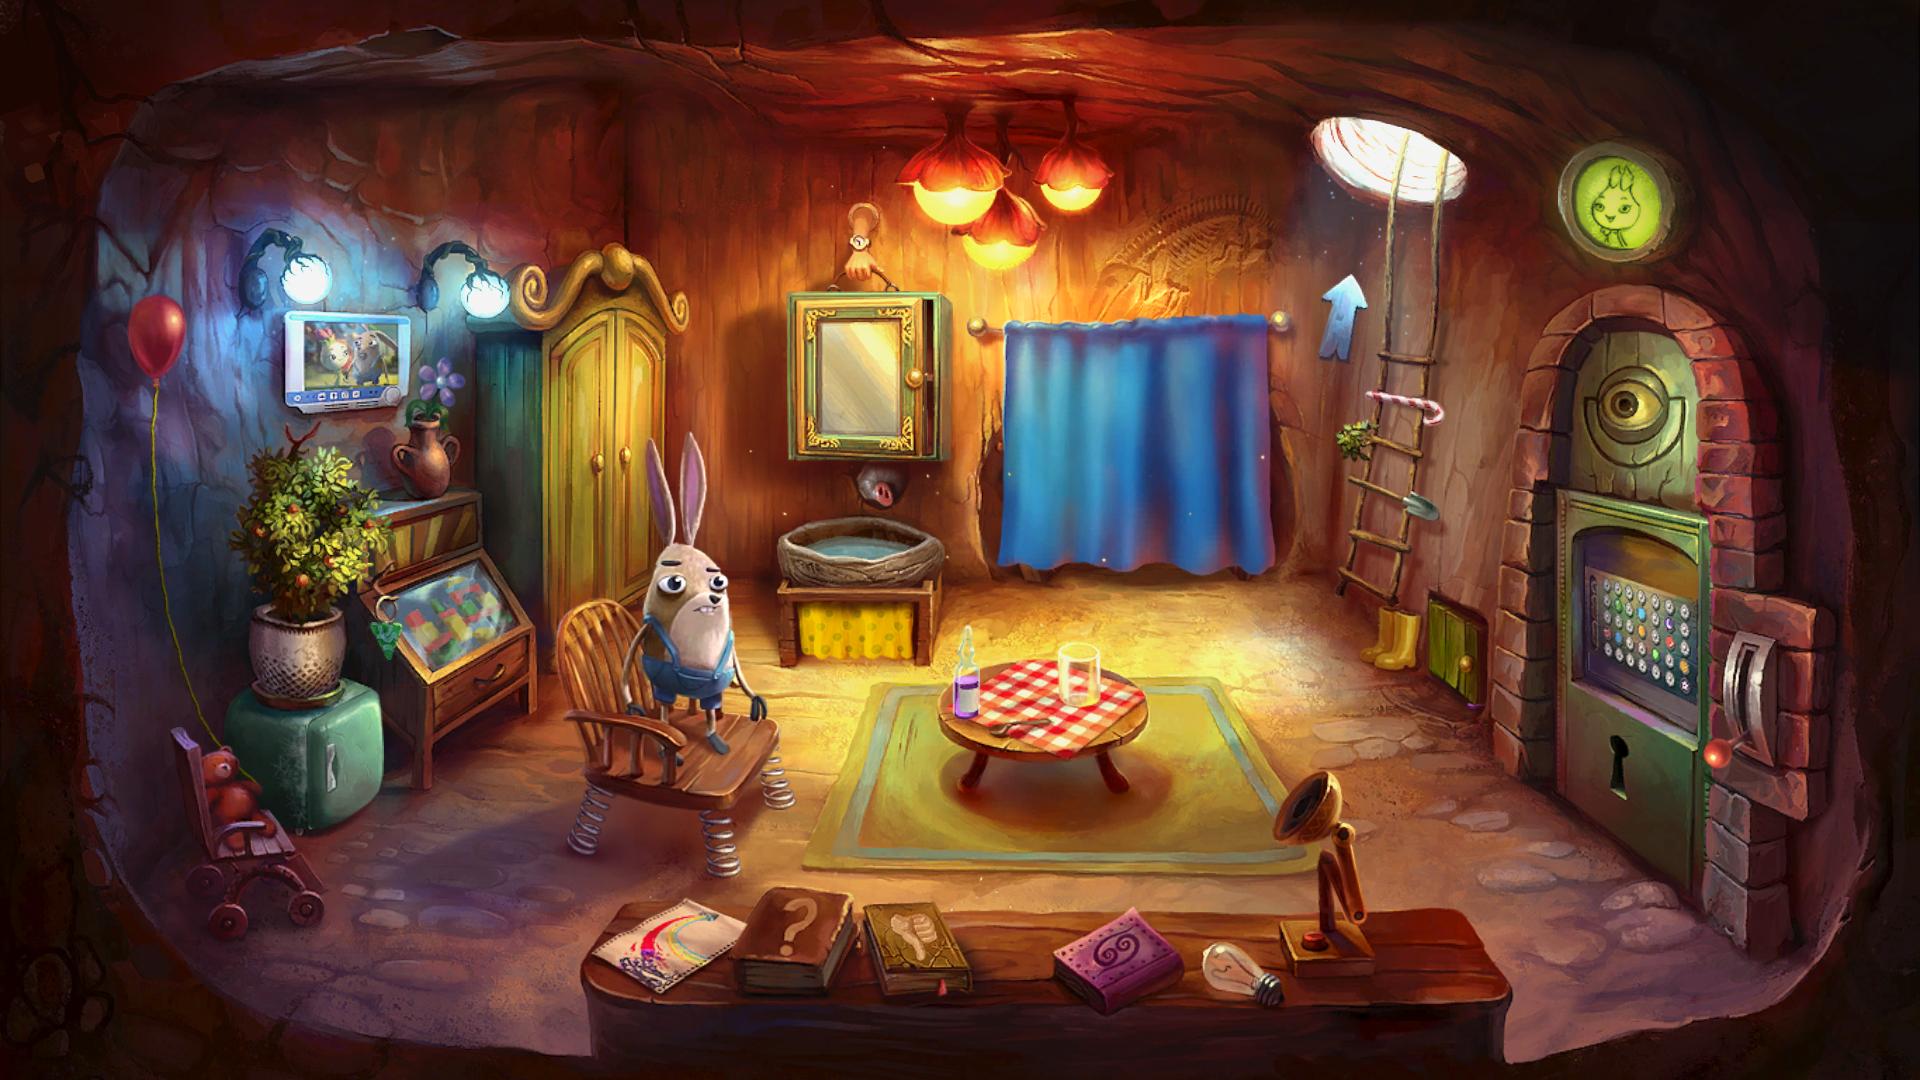 Heartwarming-Adventure-My-Brother-Rabbit-Coming-21-September-frikigamers.com.jpg